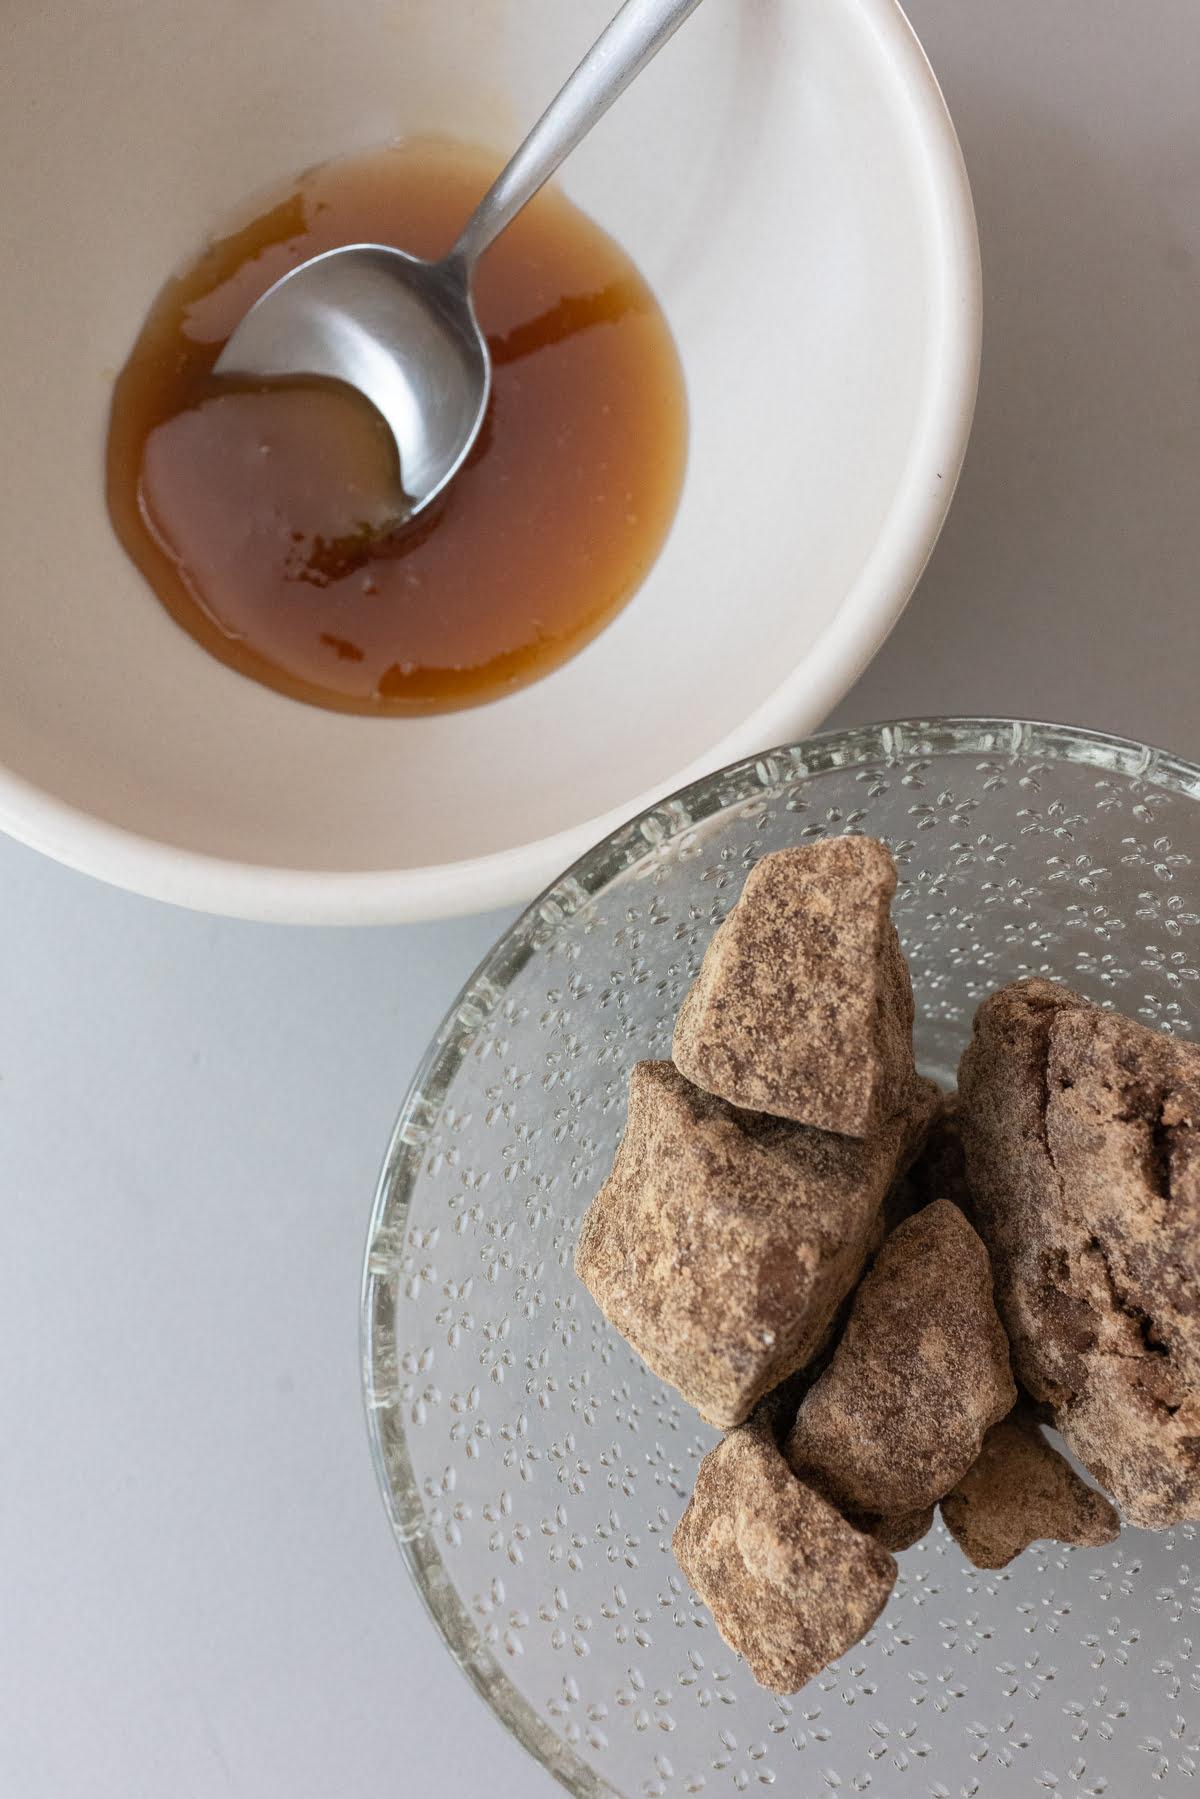 One bowl of honey and one bowl of kokuto (Japanese black sugar).